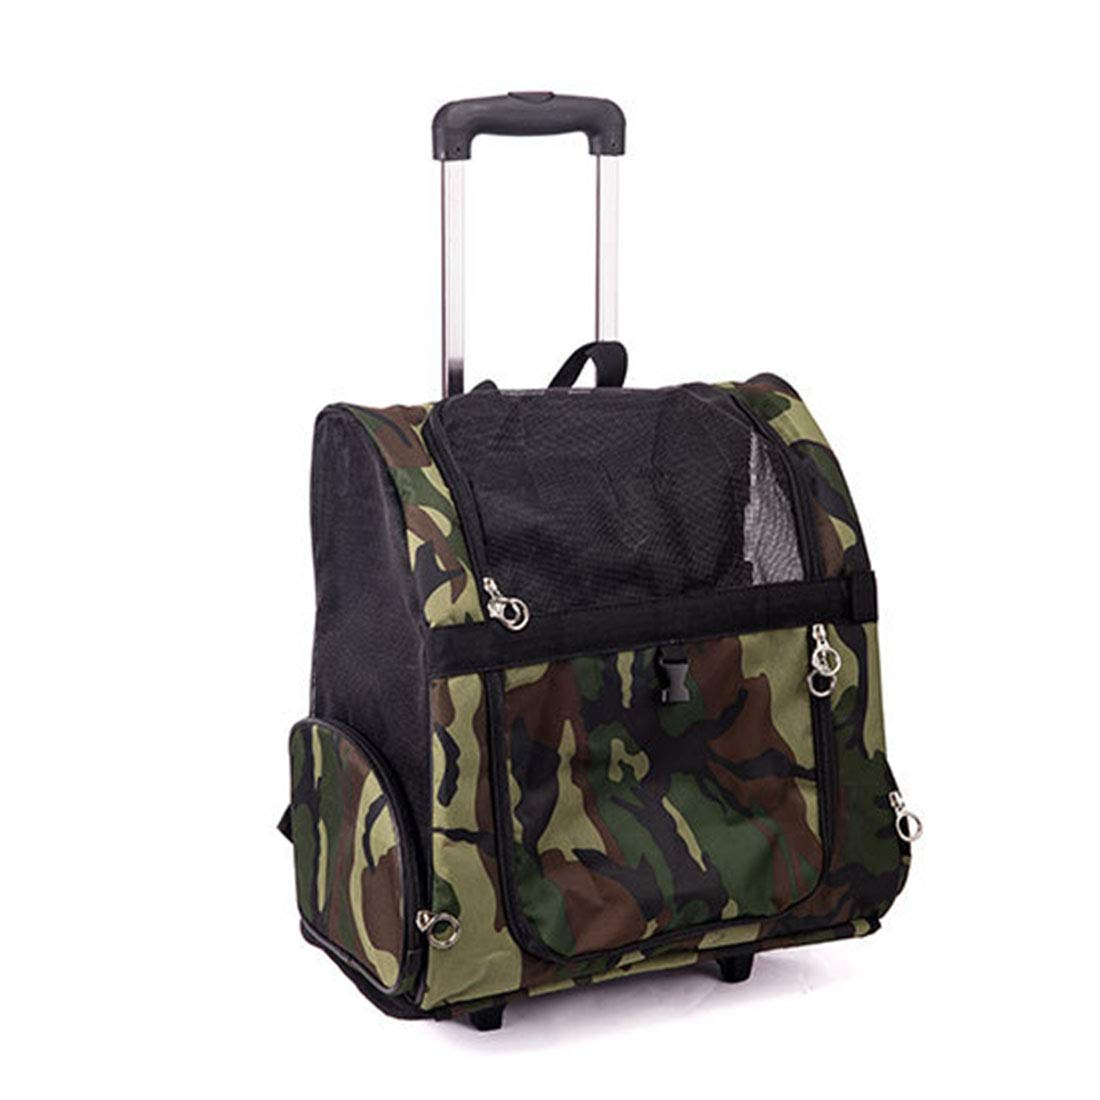 Camouflage L Camouflage L KERVINZHANG Pet Carrying Bag Pet Trolley Case Pet Box Outing Pet Box Pet Chest Backpack (color   Camouflage, Size   L)